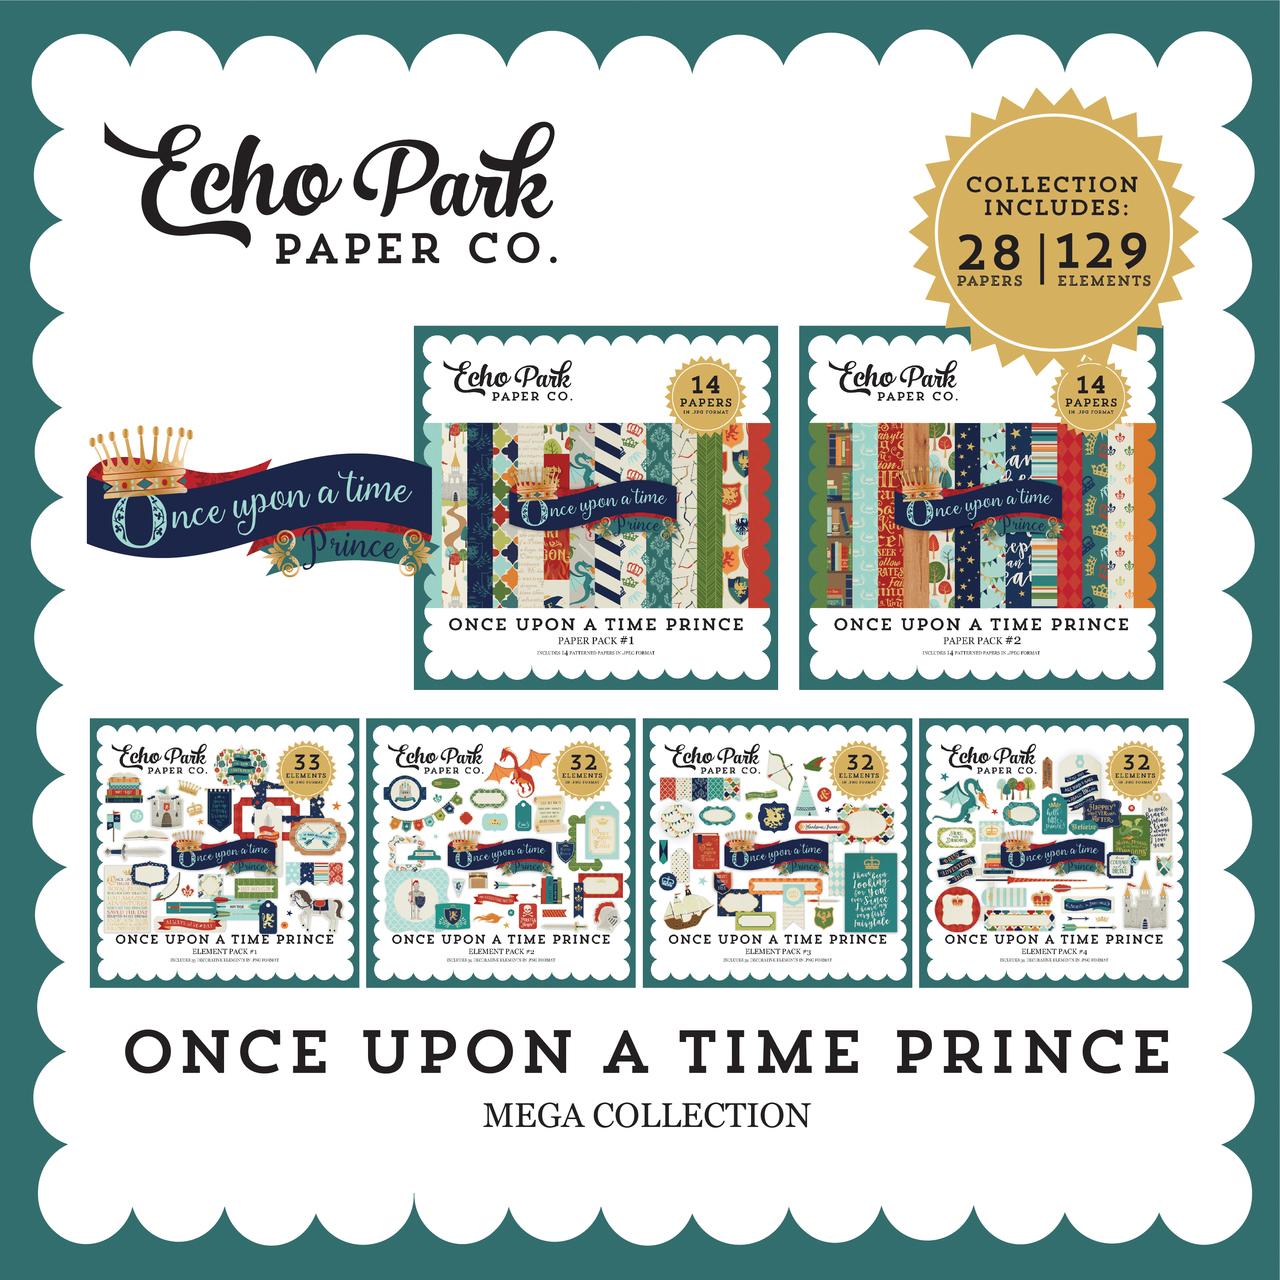 Once Upon a Time Prince Mega Collection